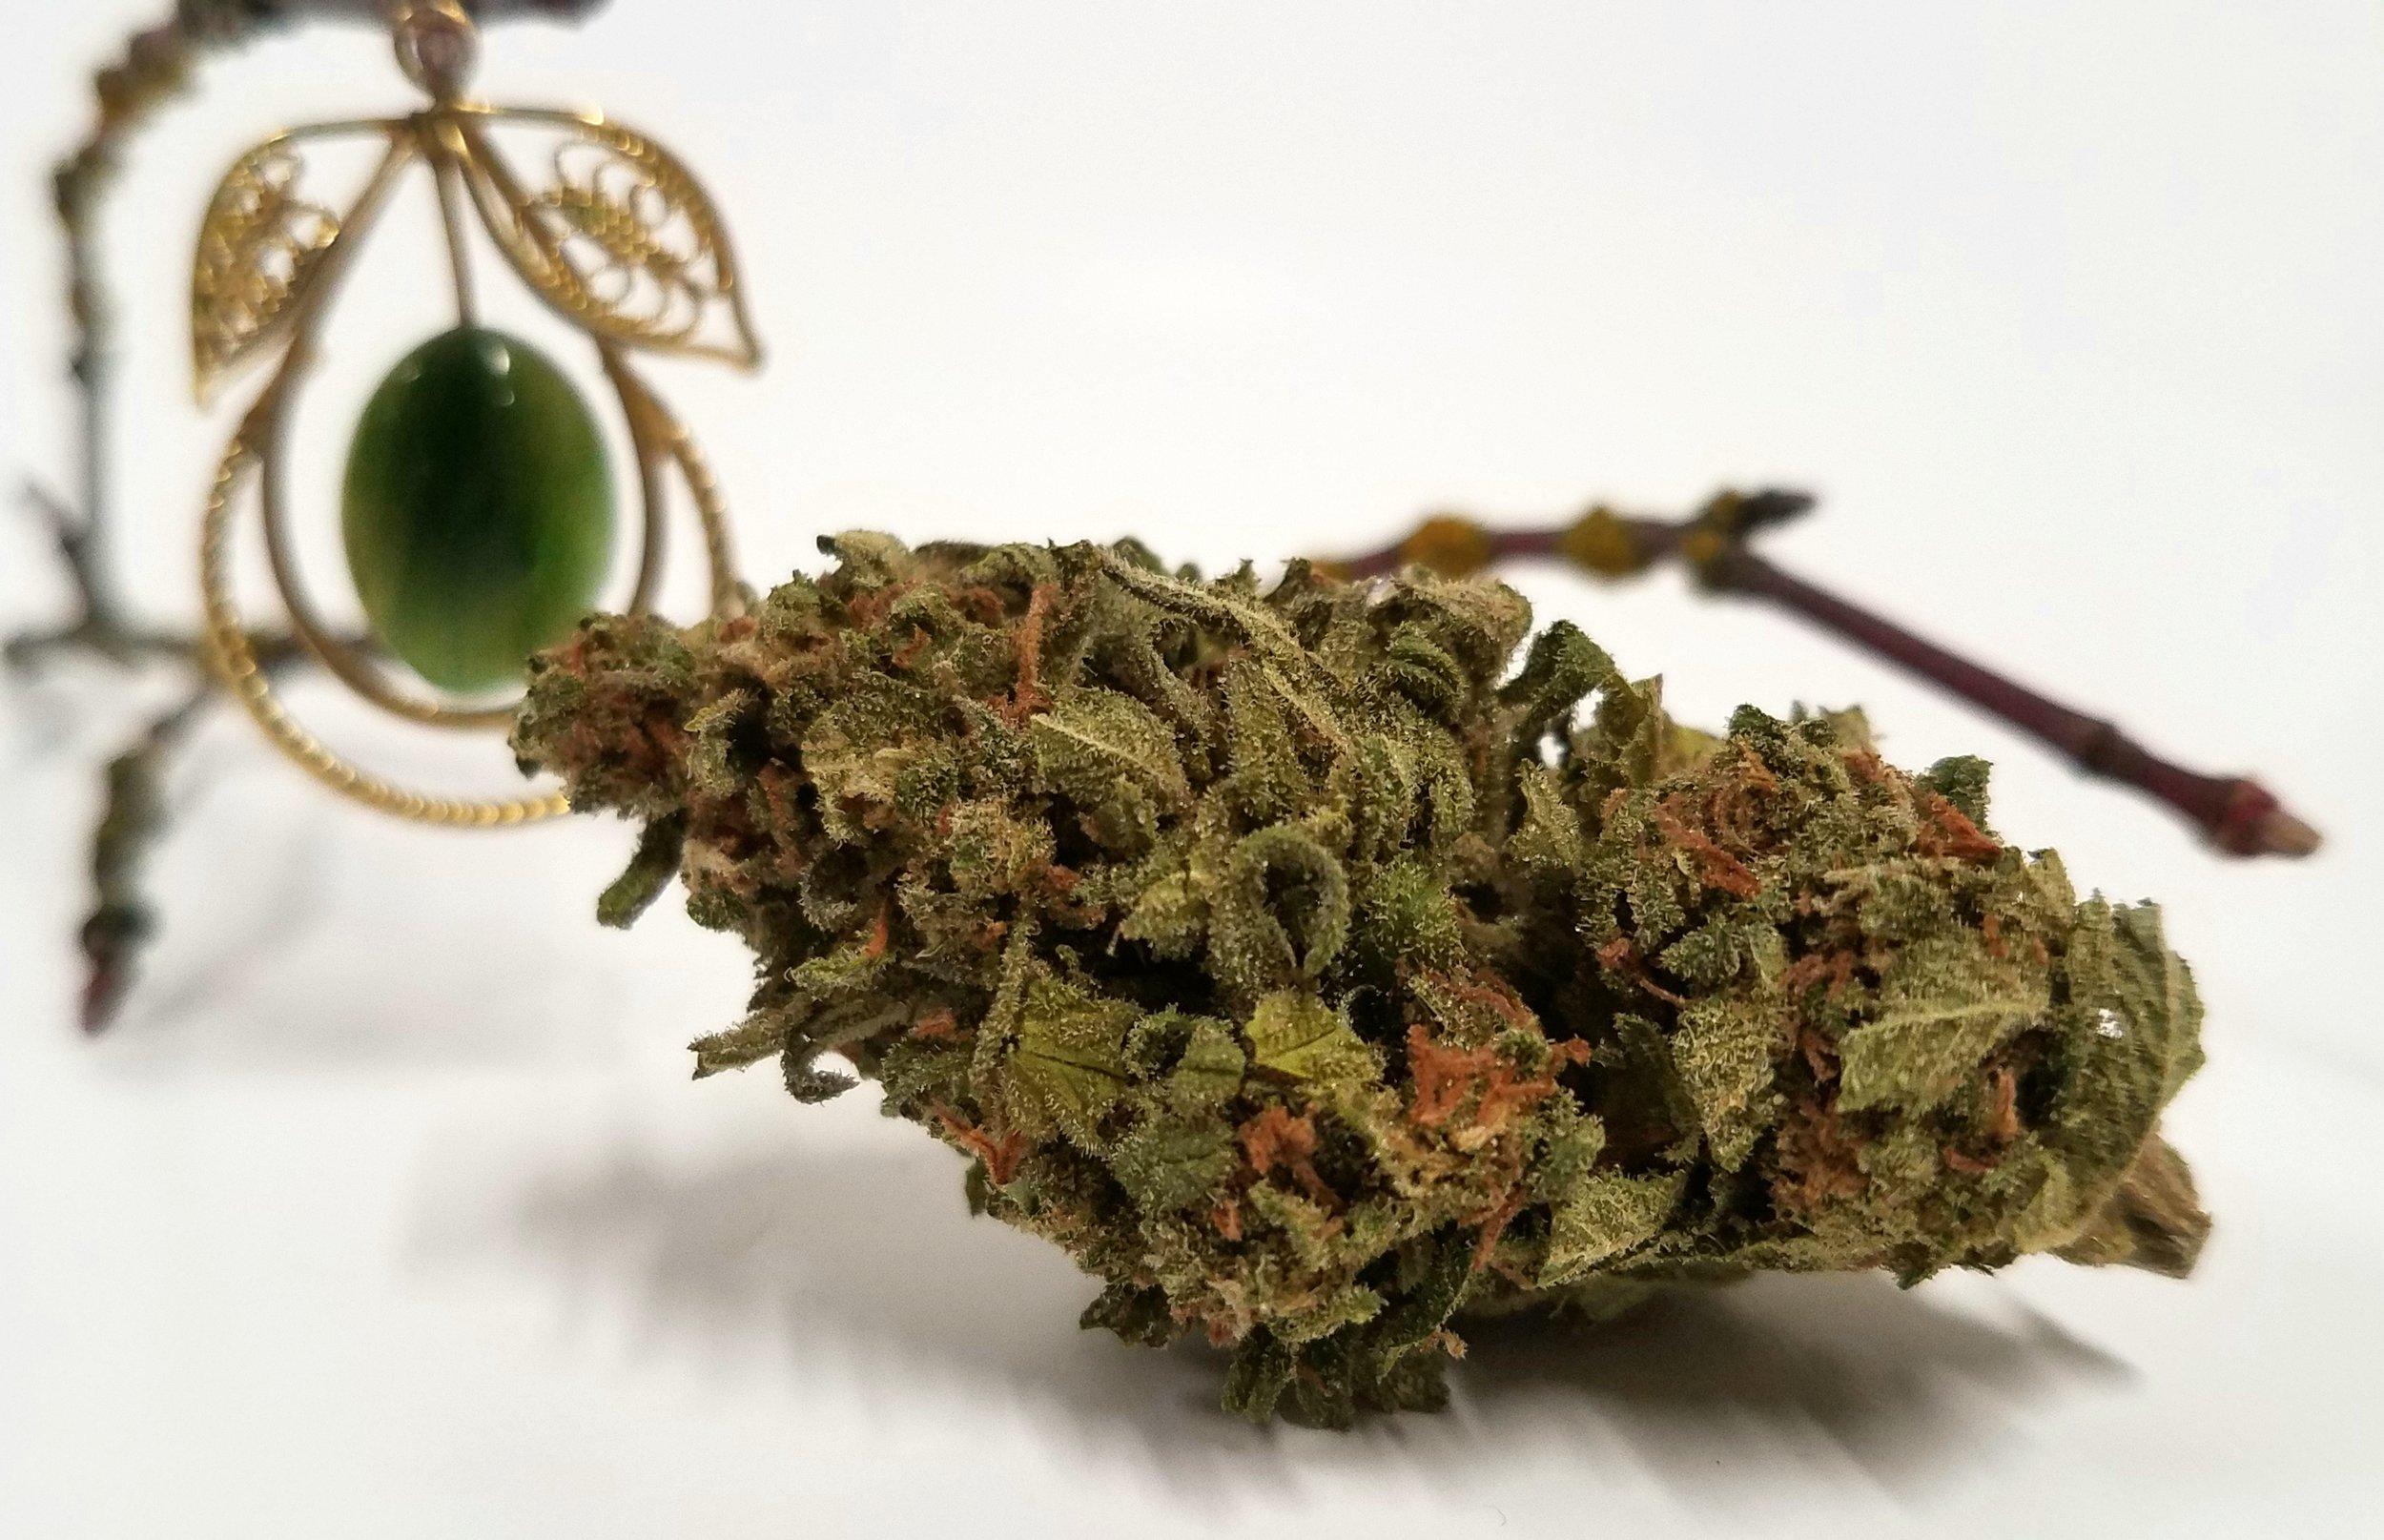 J1 grown by Cascade Valley Cannabis